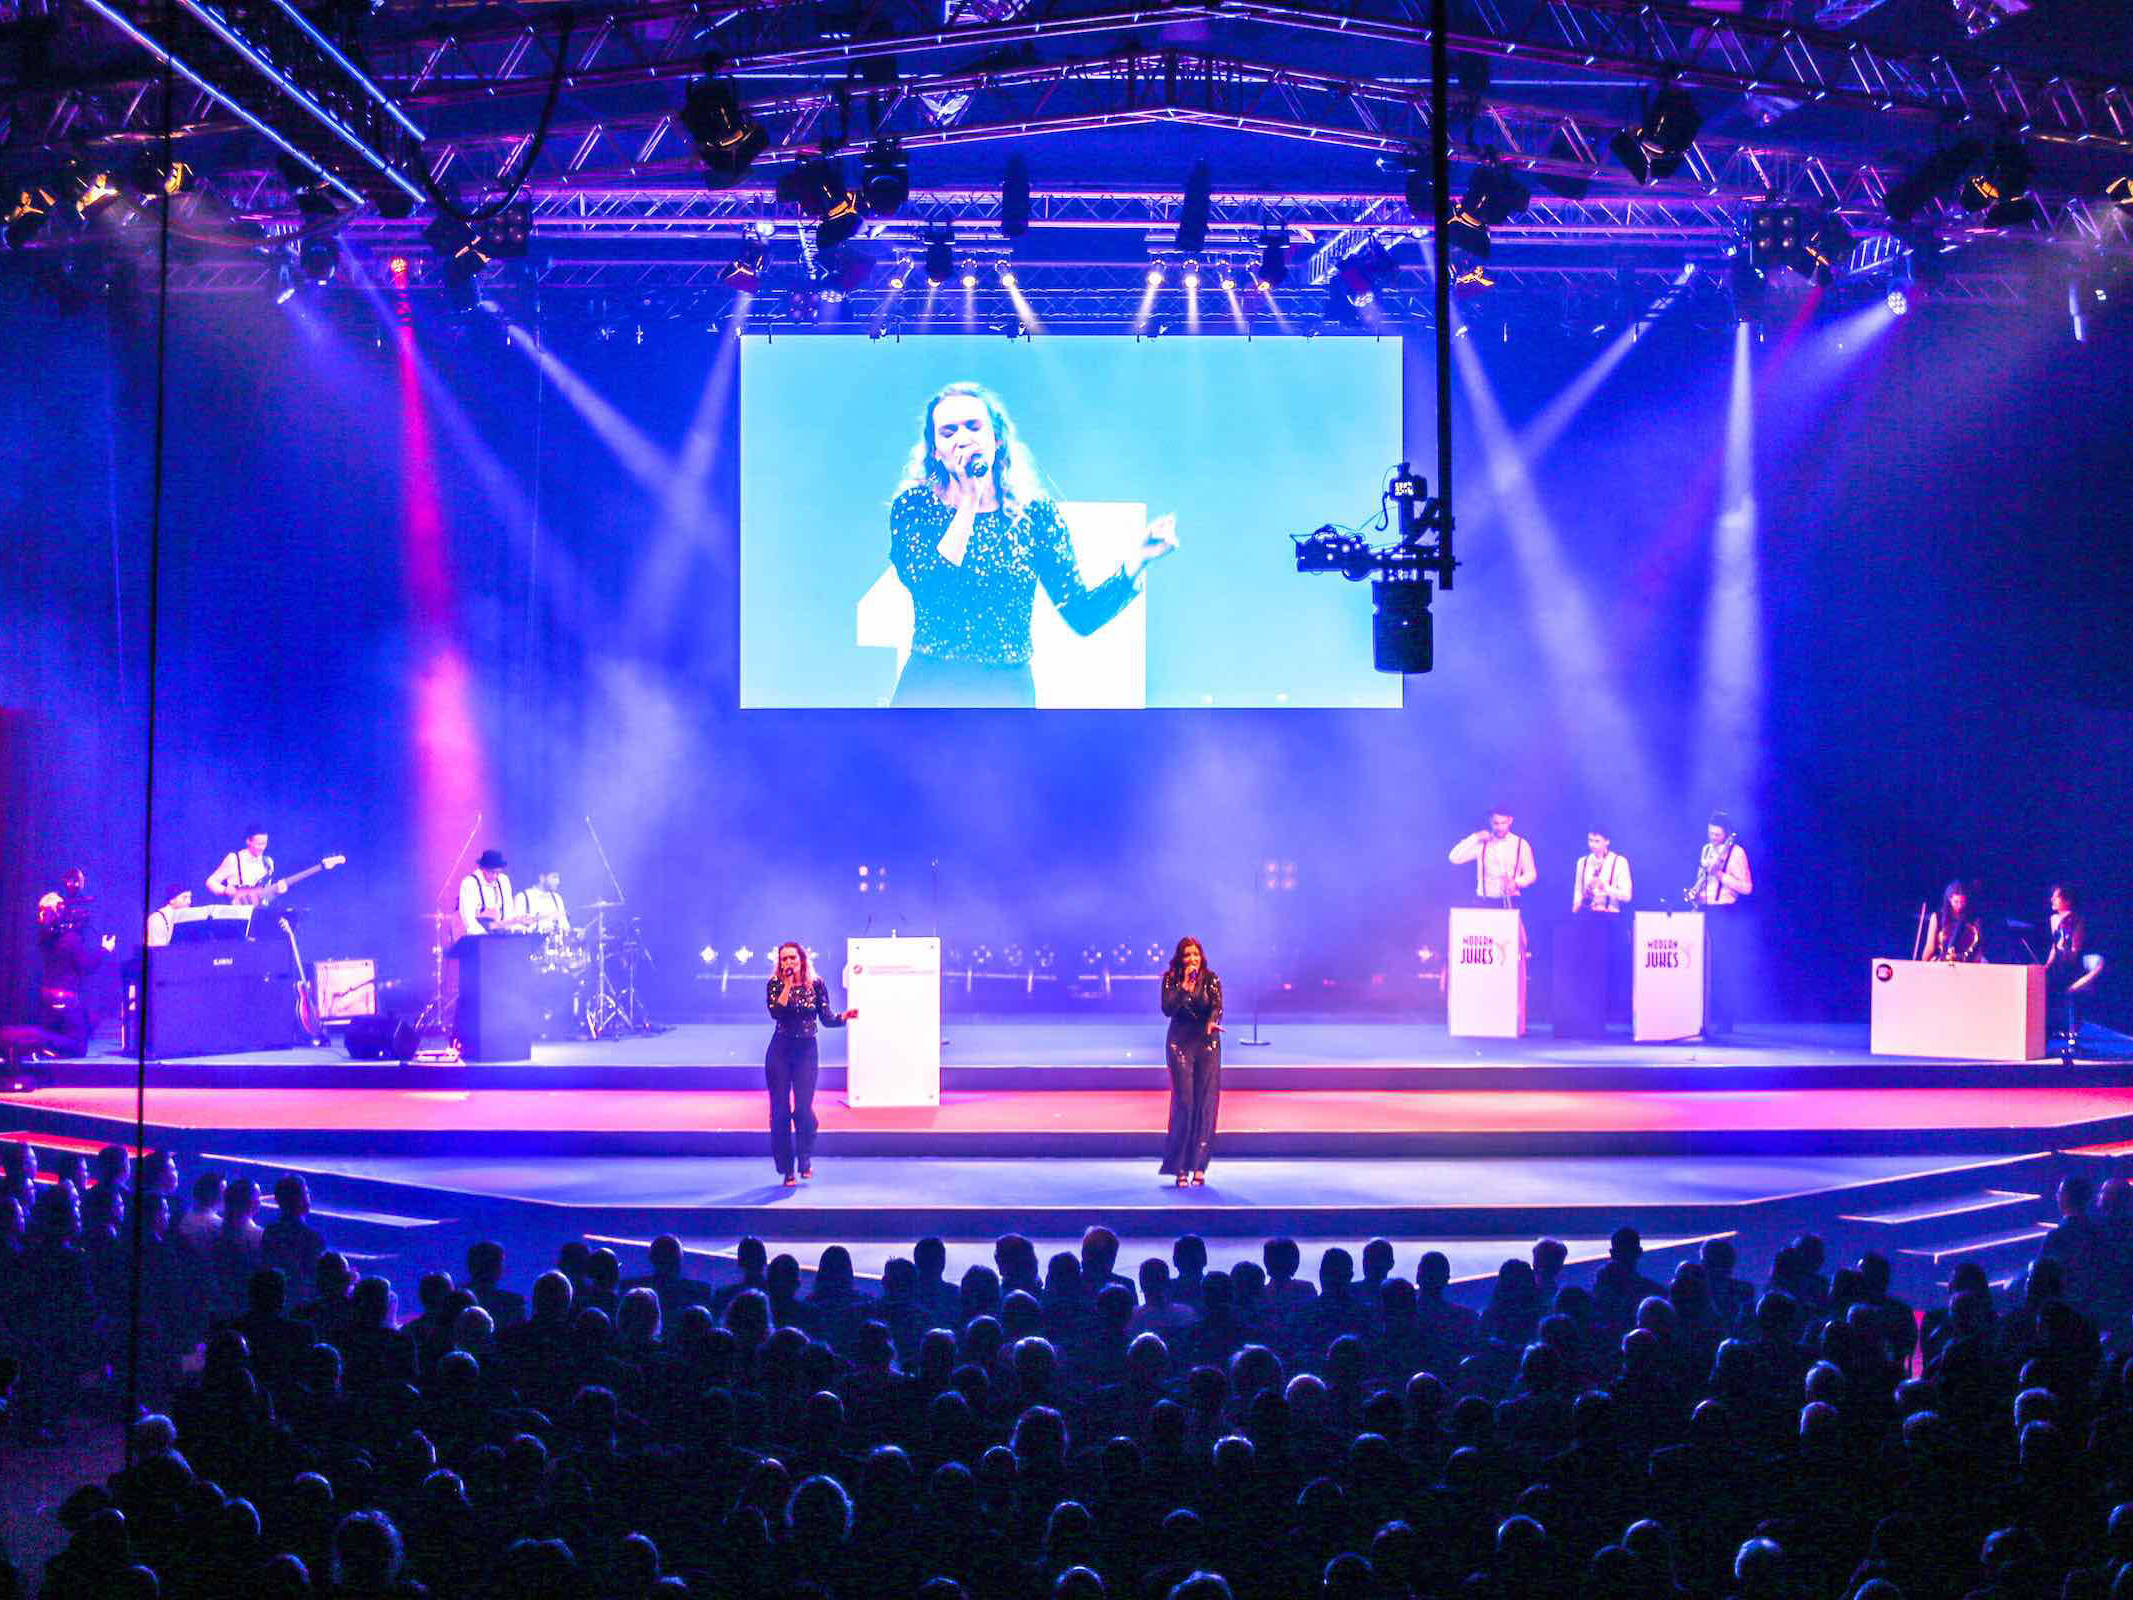 Eventplanung | Hamburg | Eventdesign | Eventausstatung | Kongresse | Shows | Galas | Modenschauen | Produktpräsentationen | Bühnenbau | Lichttechnik | LCD | Leinwand | Tontechnik | Logistik | Künstler